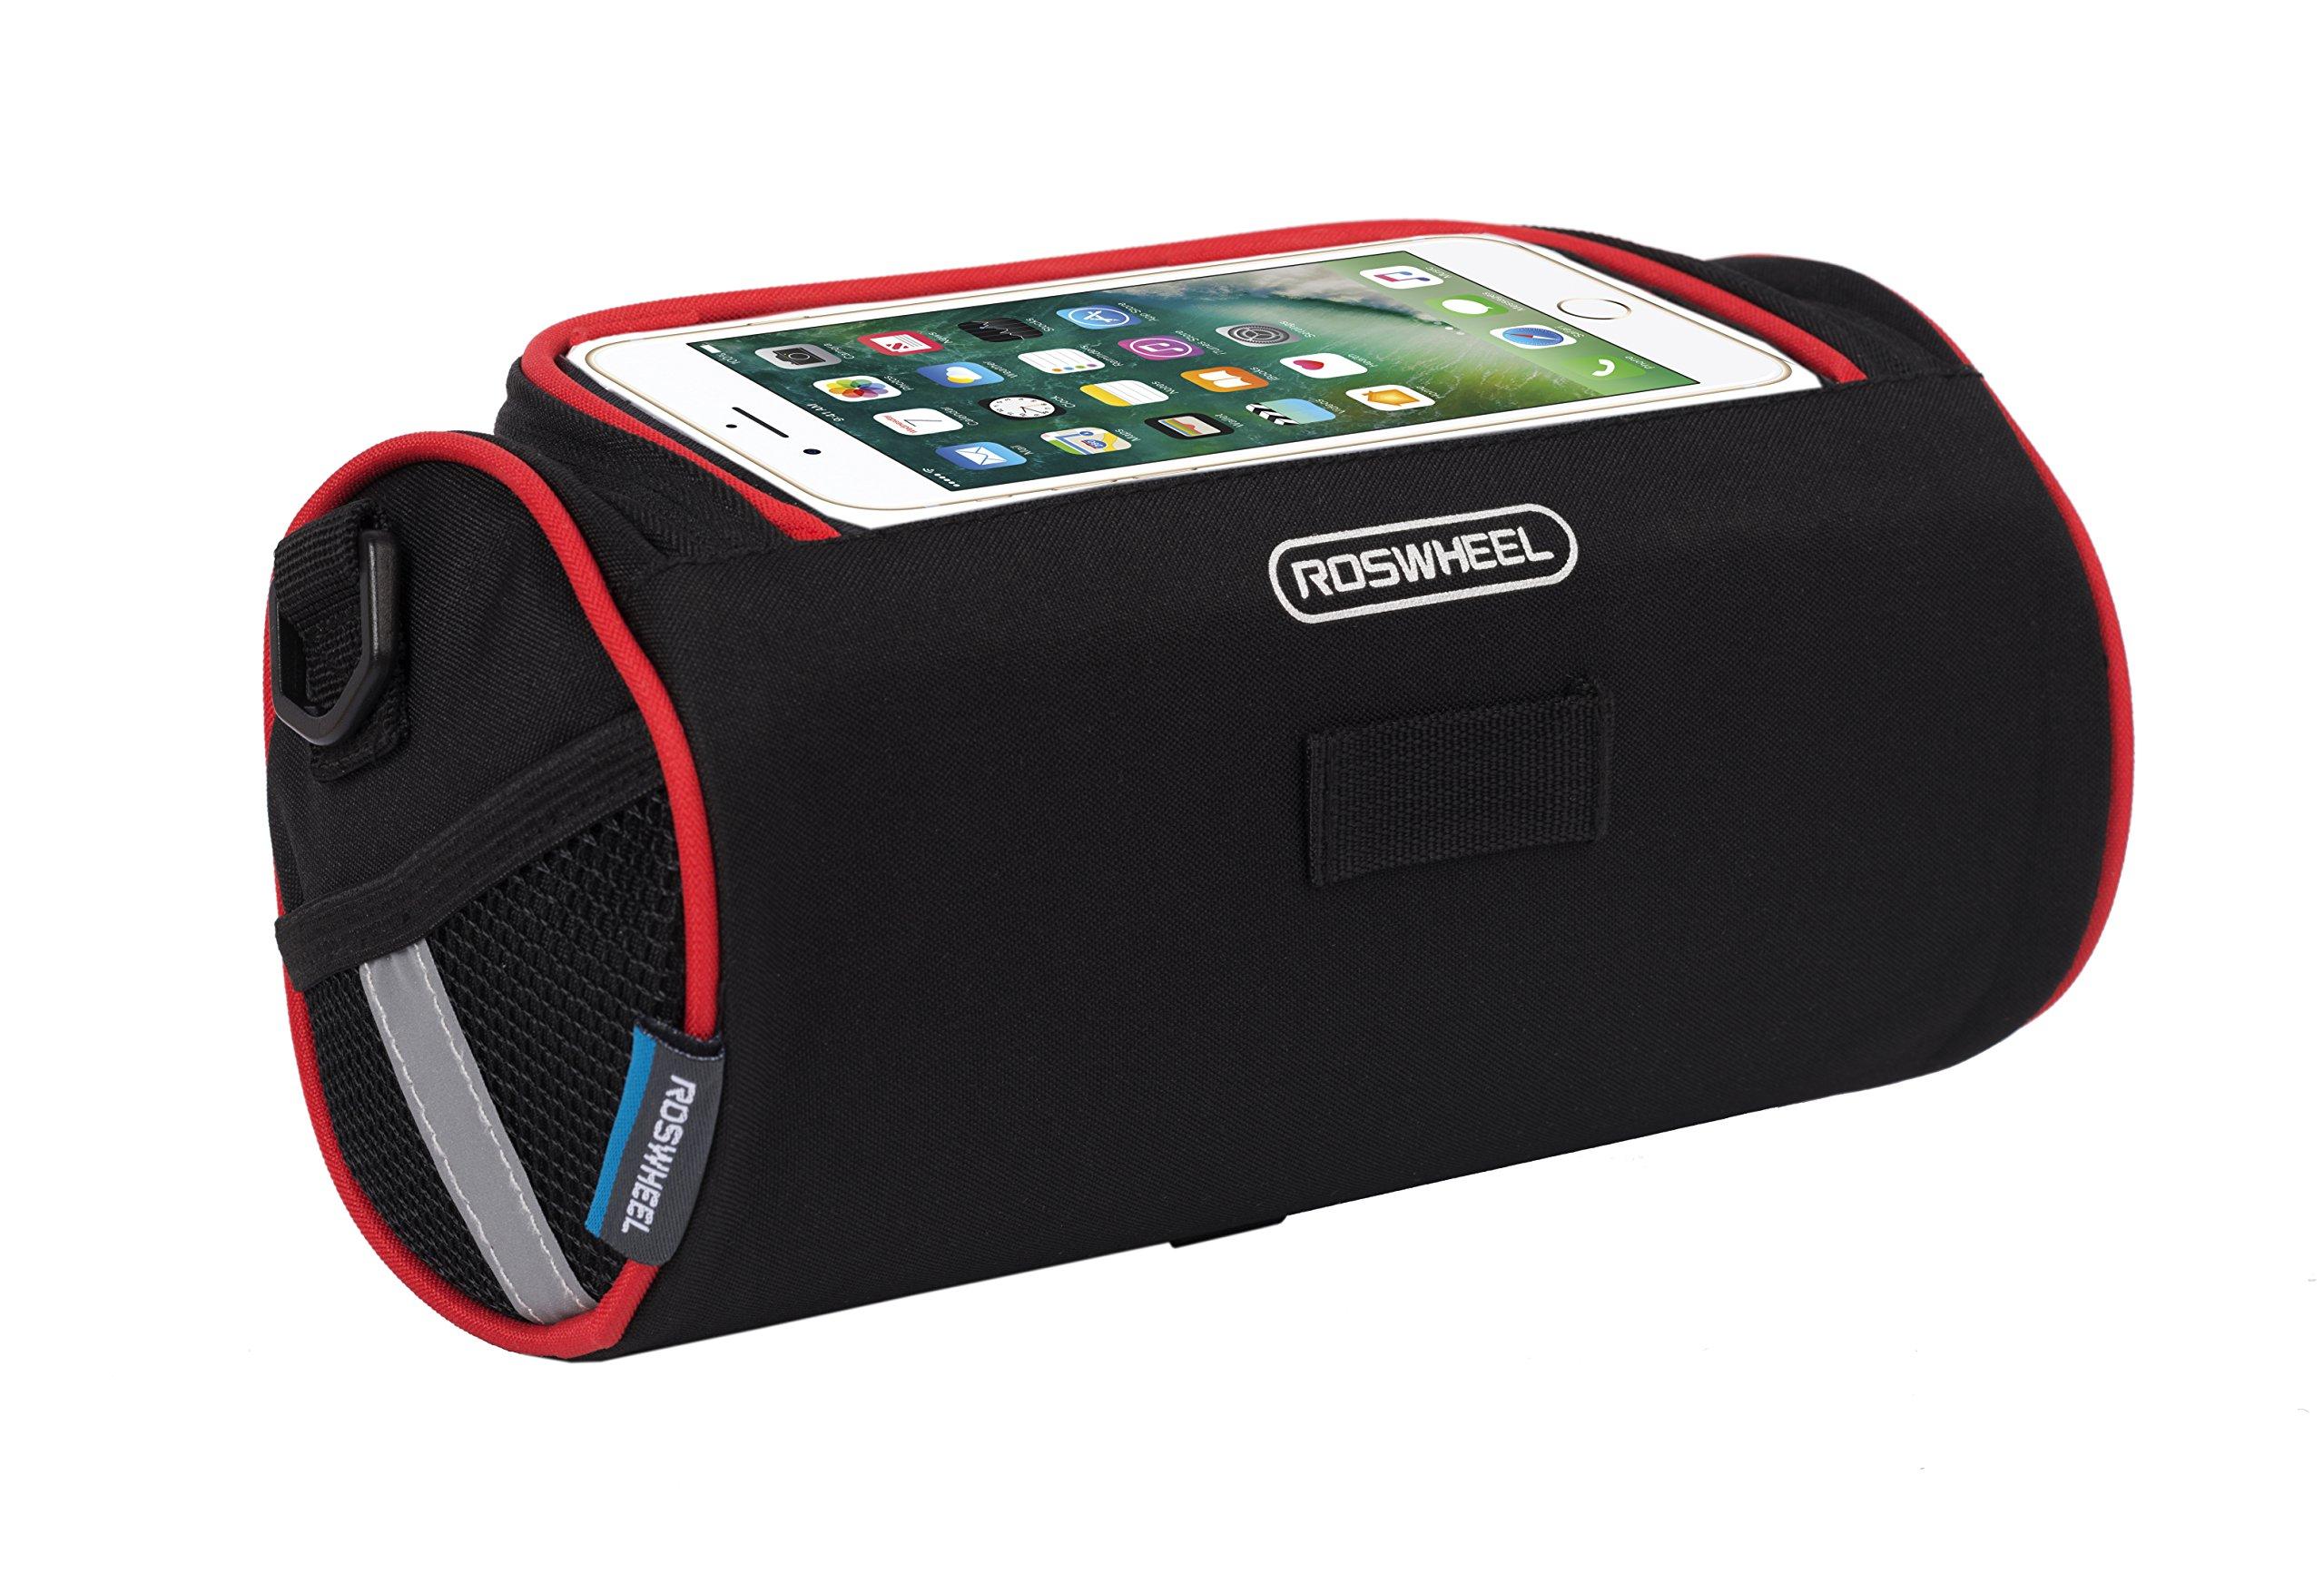 Roswheel 11887 3.5 liters Capacity Bike Bicycle Handlebar Bag with Phone or Map Holder